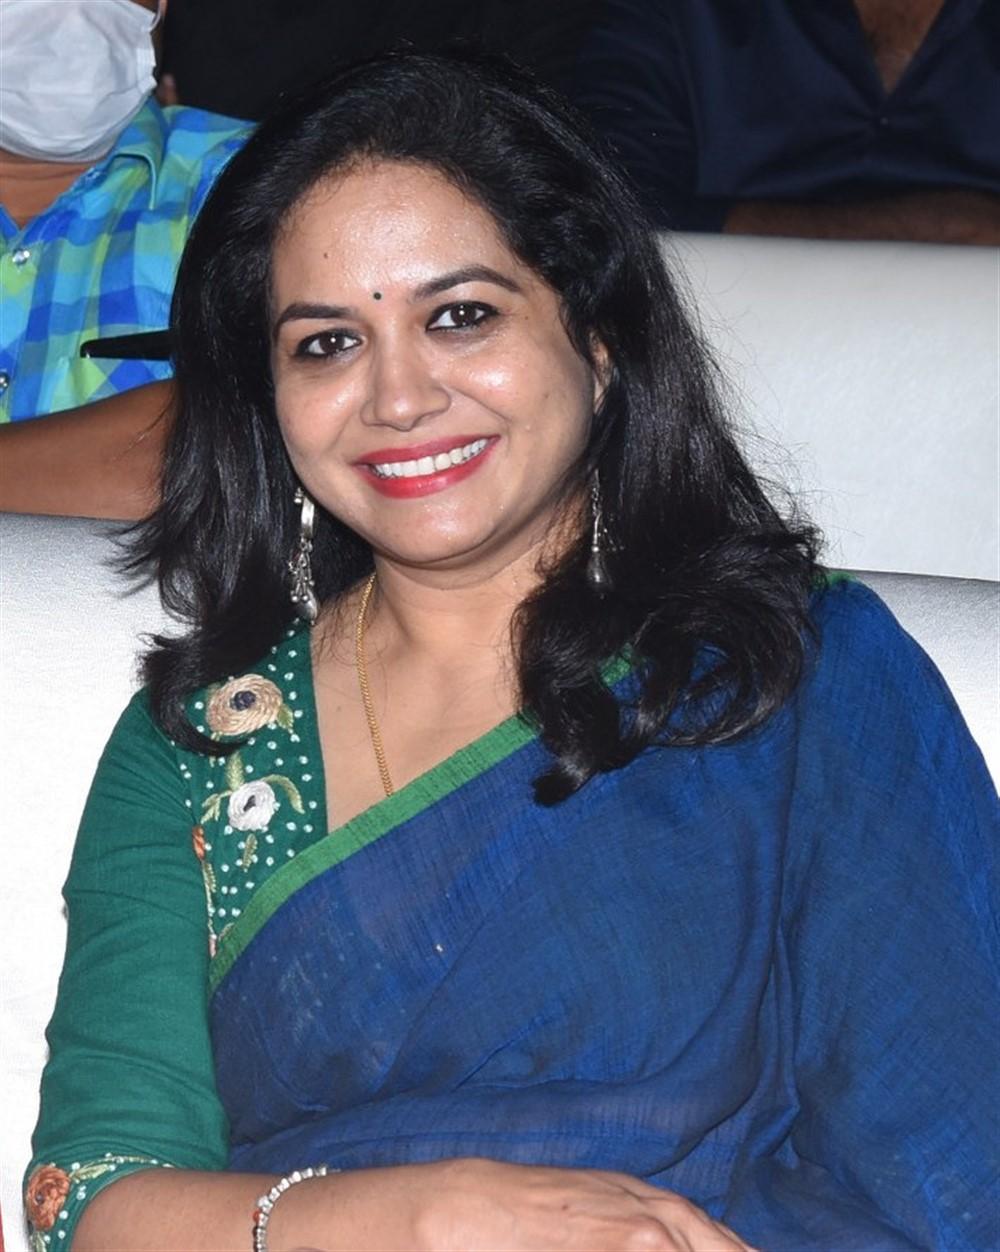 Telugu Singer Sunitha Pictures @ Gully Rowdy Pre Release